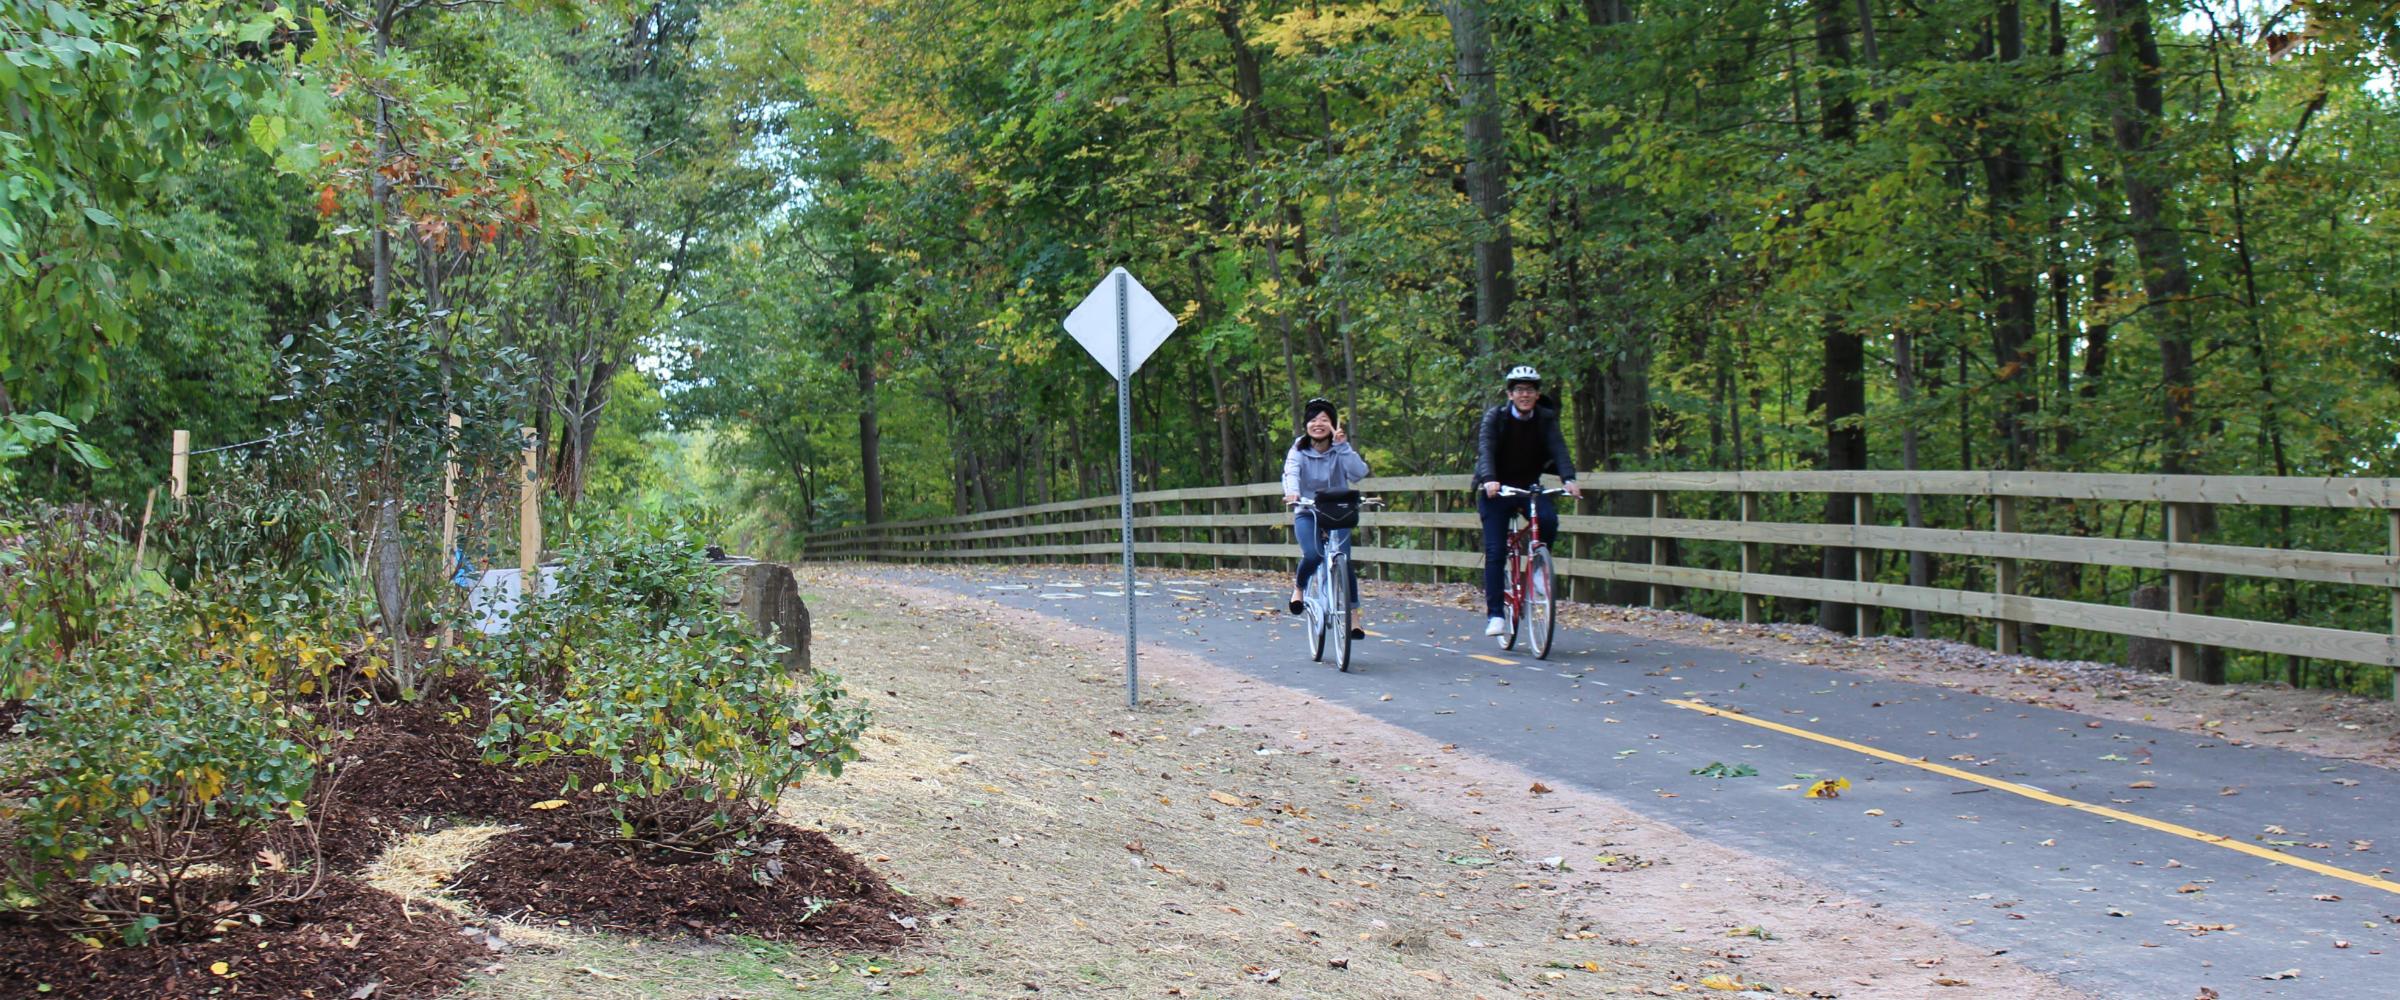 Plants for Birds: Burlington - Greenway (Bike Path)